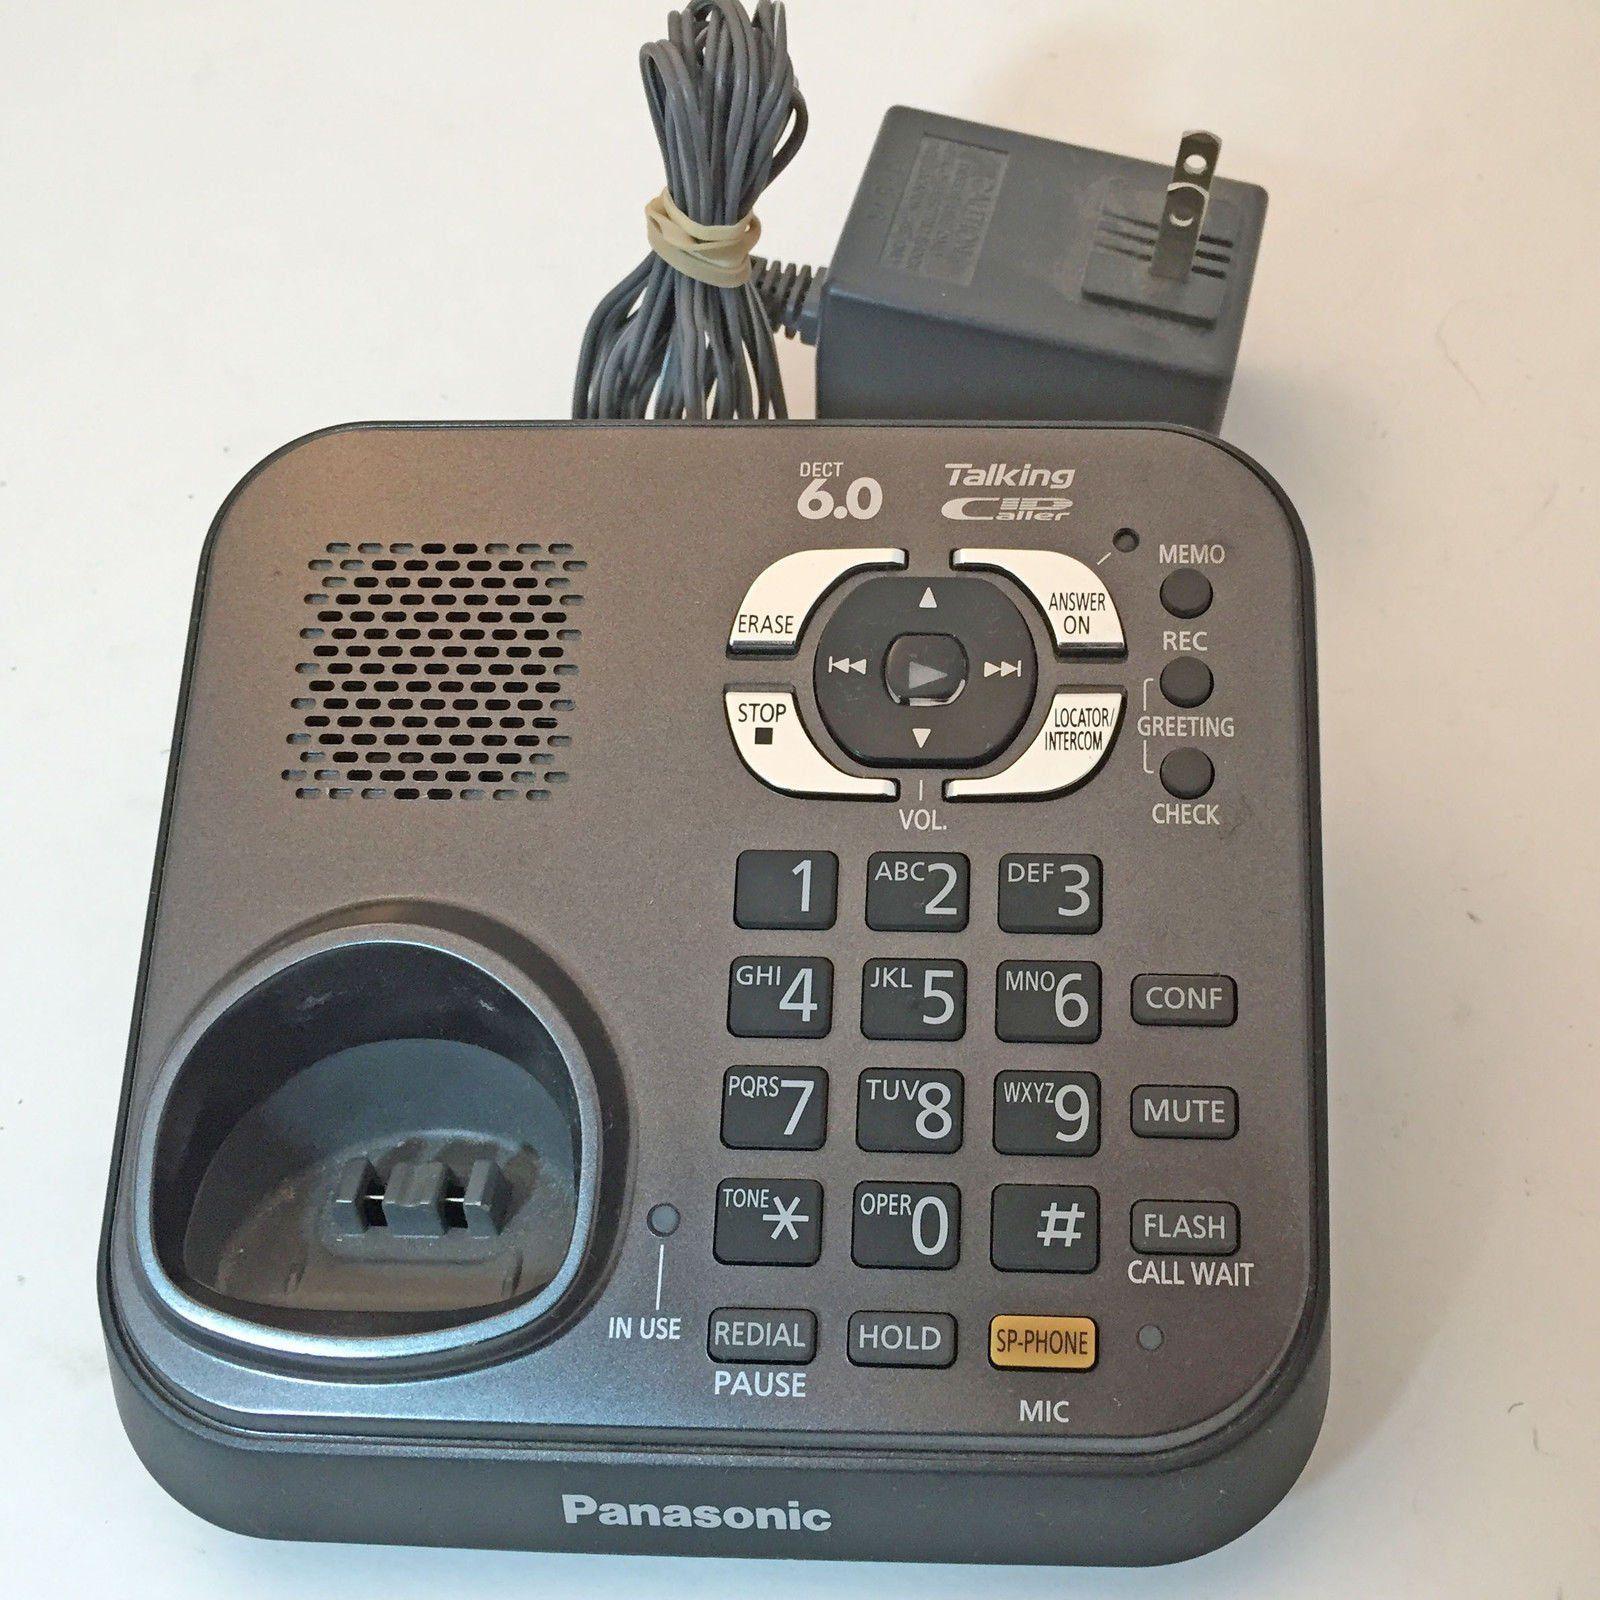 panasonic kx tg9341t phone system main base kx tg9344t with adapter rh pinterest com au Panasonic Kx- Tg270 Sim Panasonic Kx- Tg270 Sim